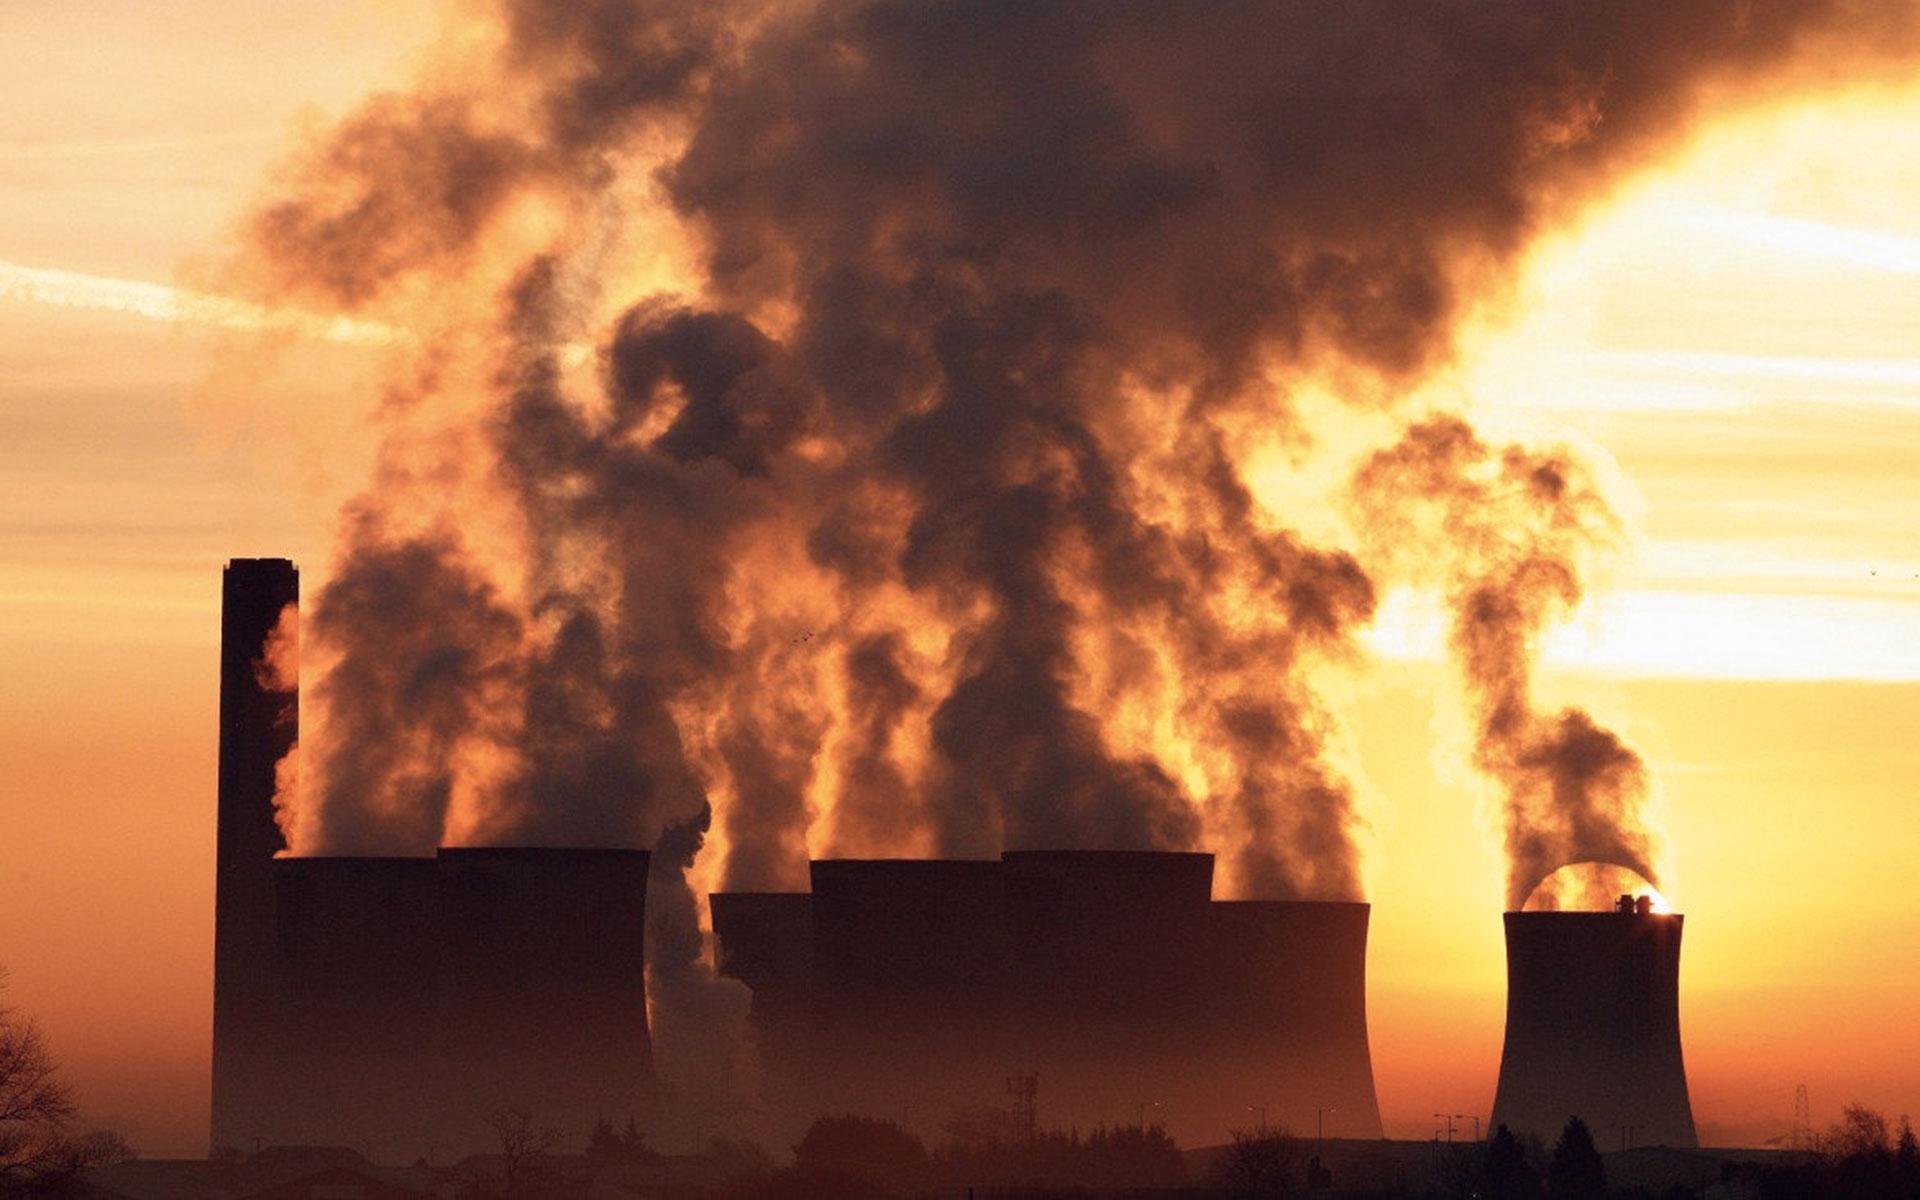 campagna carbone wwf - ciminiere carbone